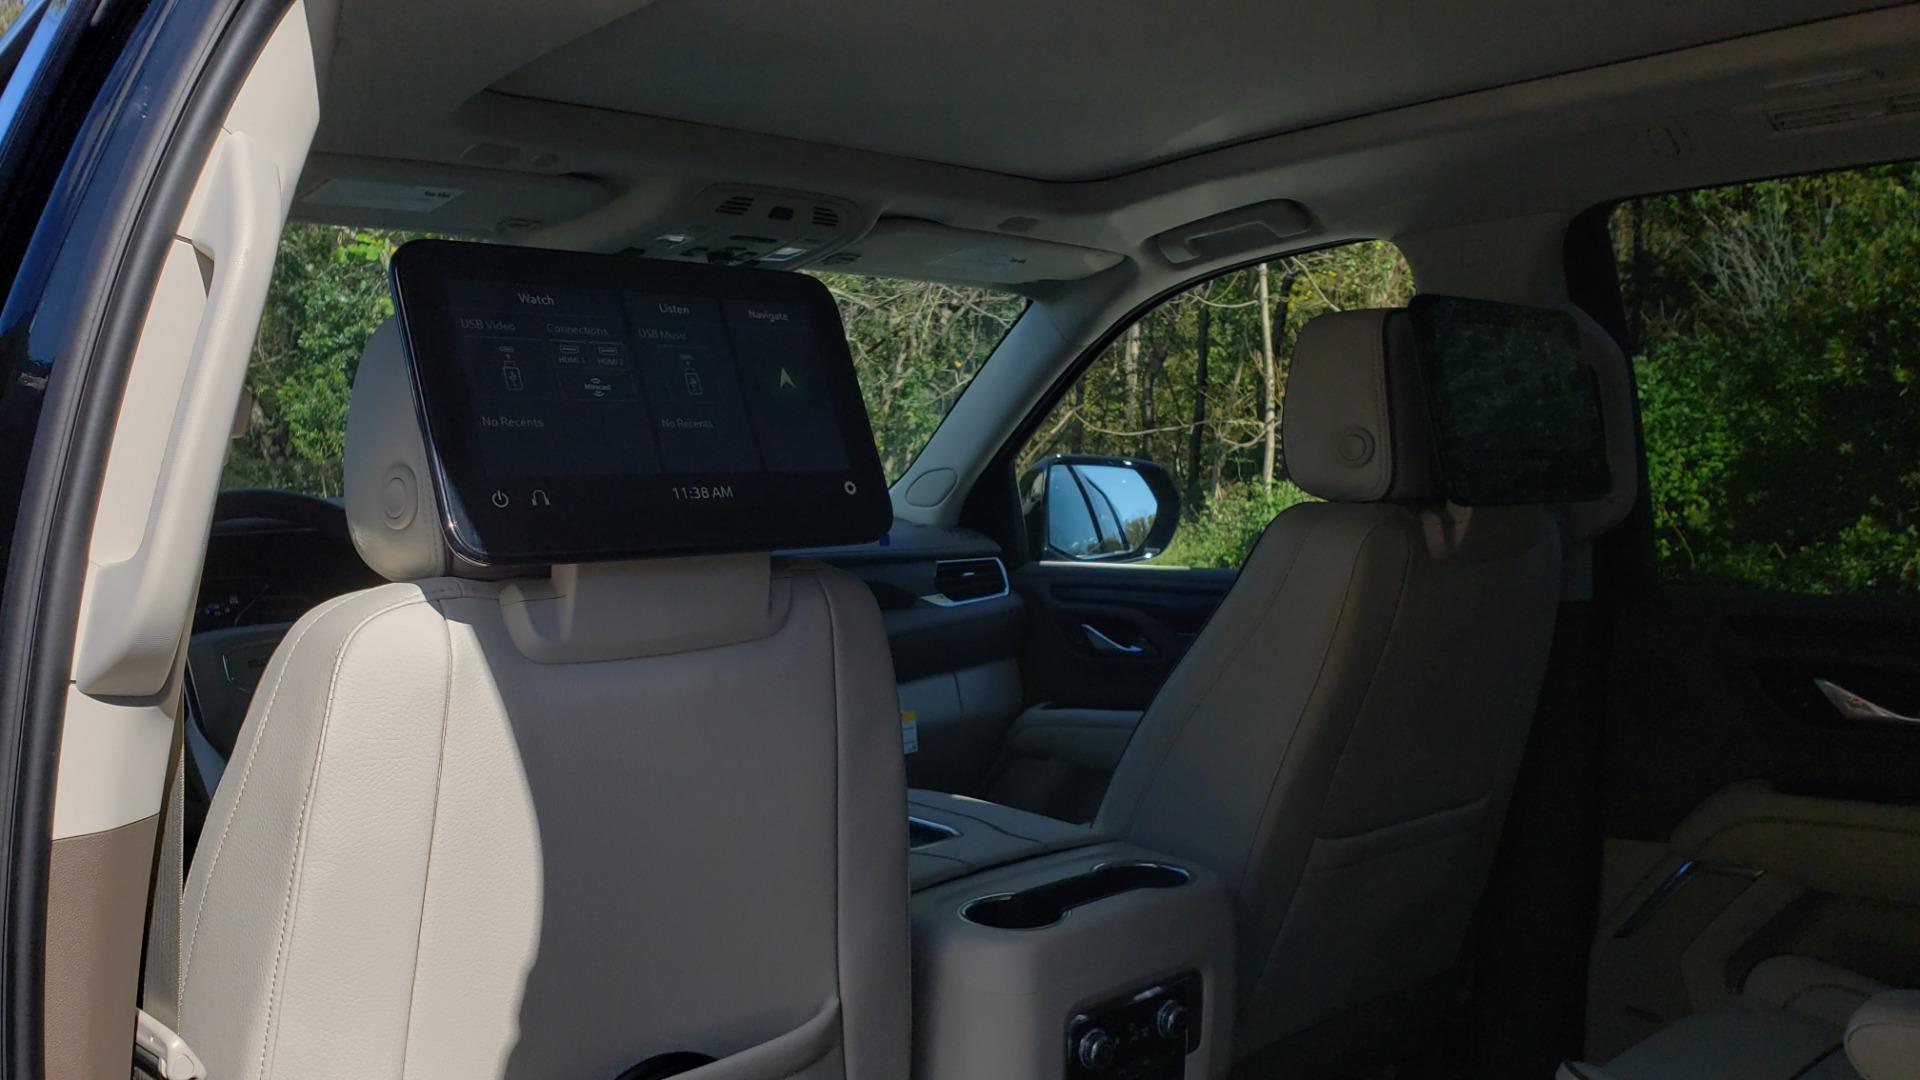 Used 2021 GMC YUKON DENALI PREMIUM 4WD / NAV / ADVANCED TECH / ENTERTAINMENT for sale Sold at Formula Imports in Charlotte NC 28227 73